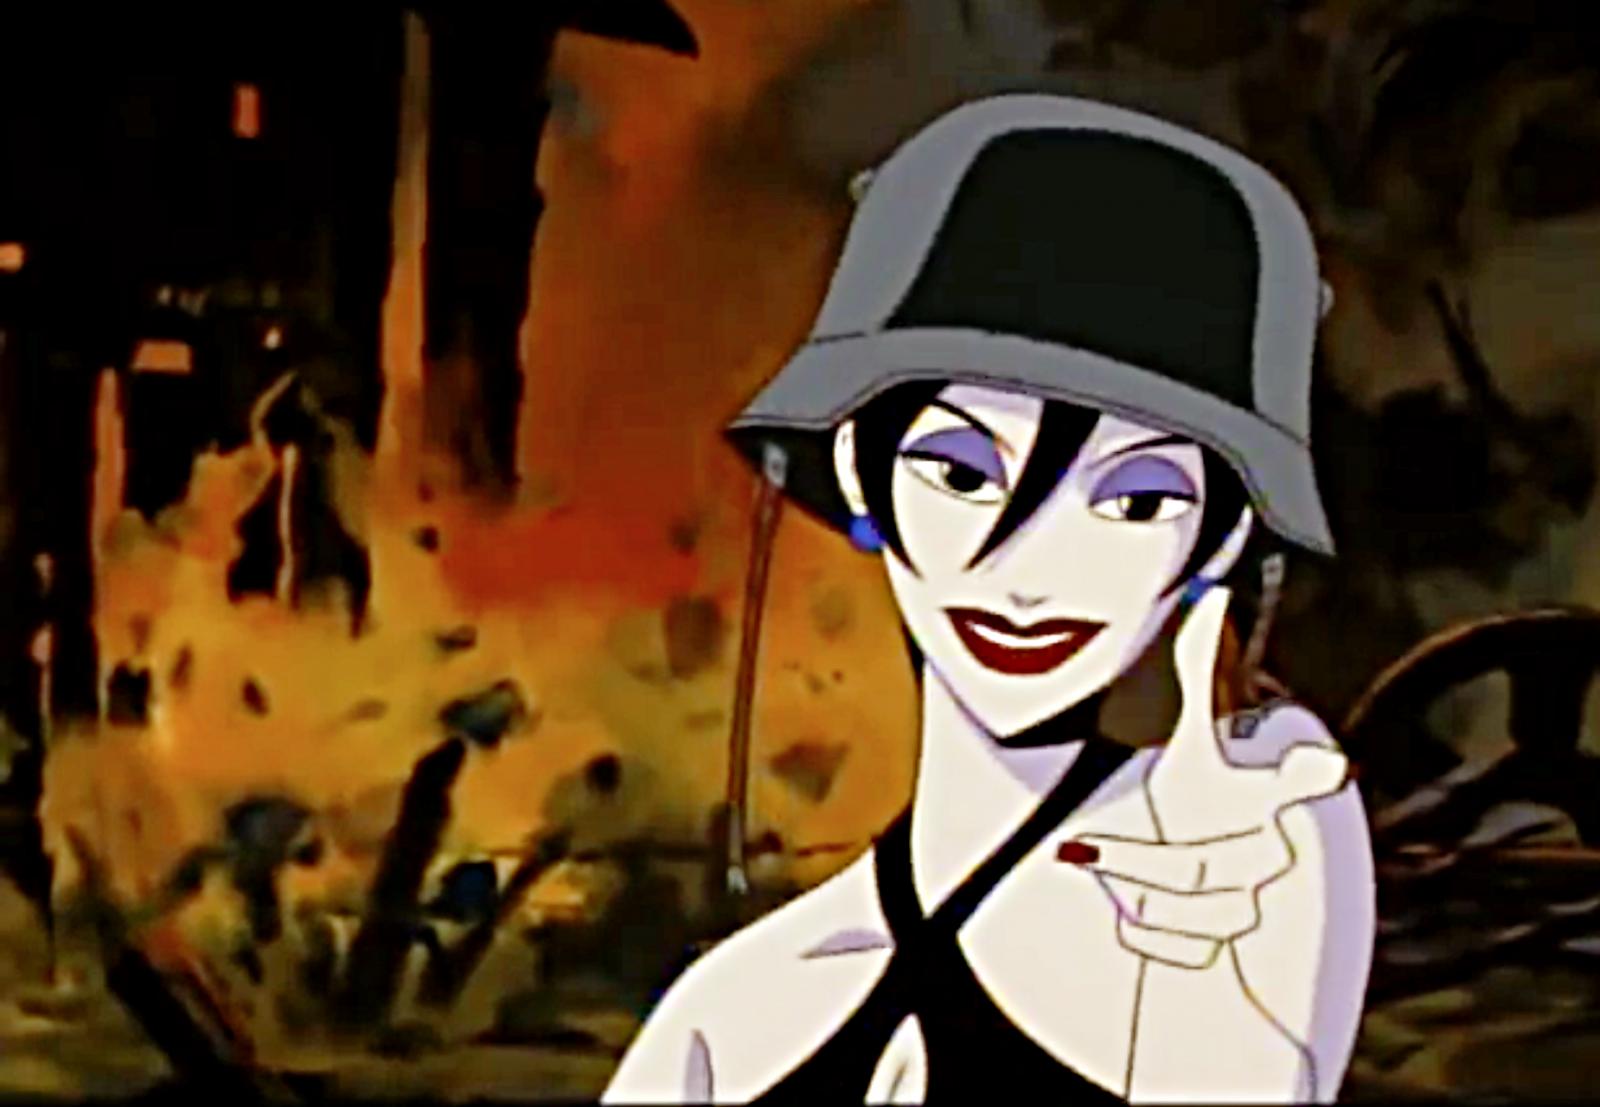 TOP 10 nejlepších animovaných klipů: Novinka od IDLES, klasiky od Pearl Jam, U2, Prince, Radiohead a dalších